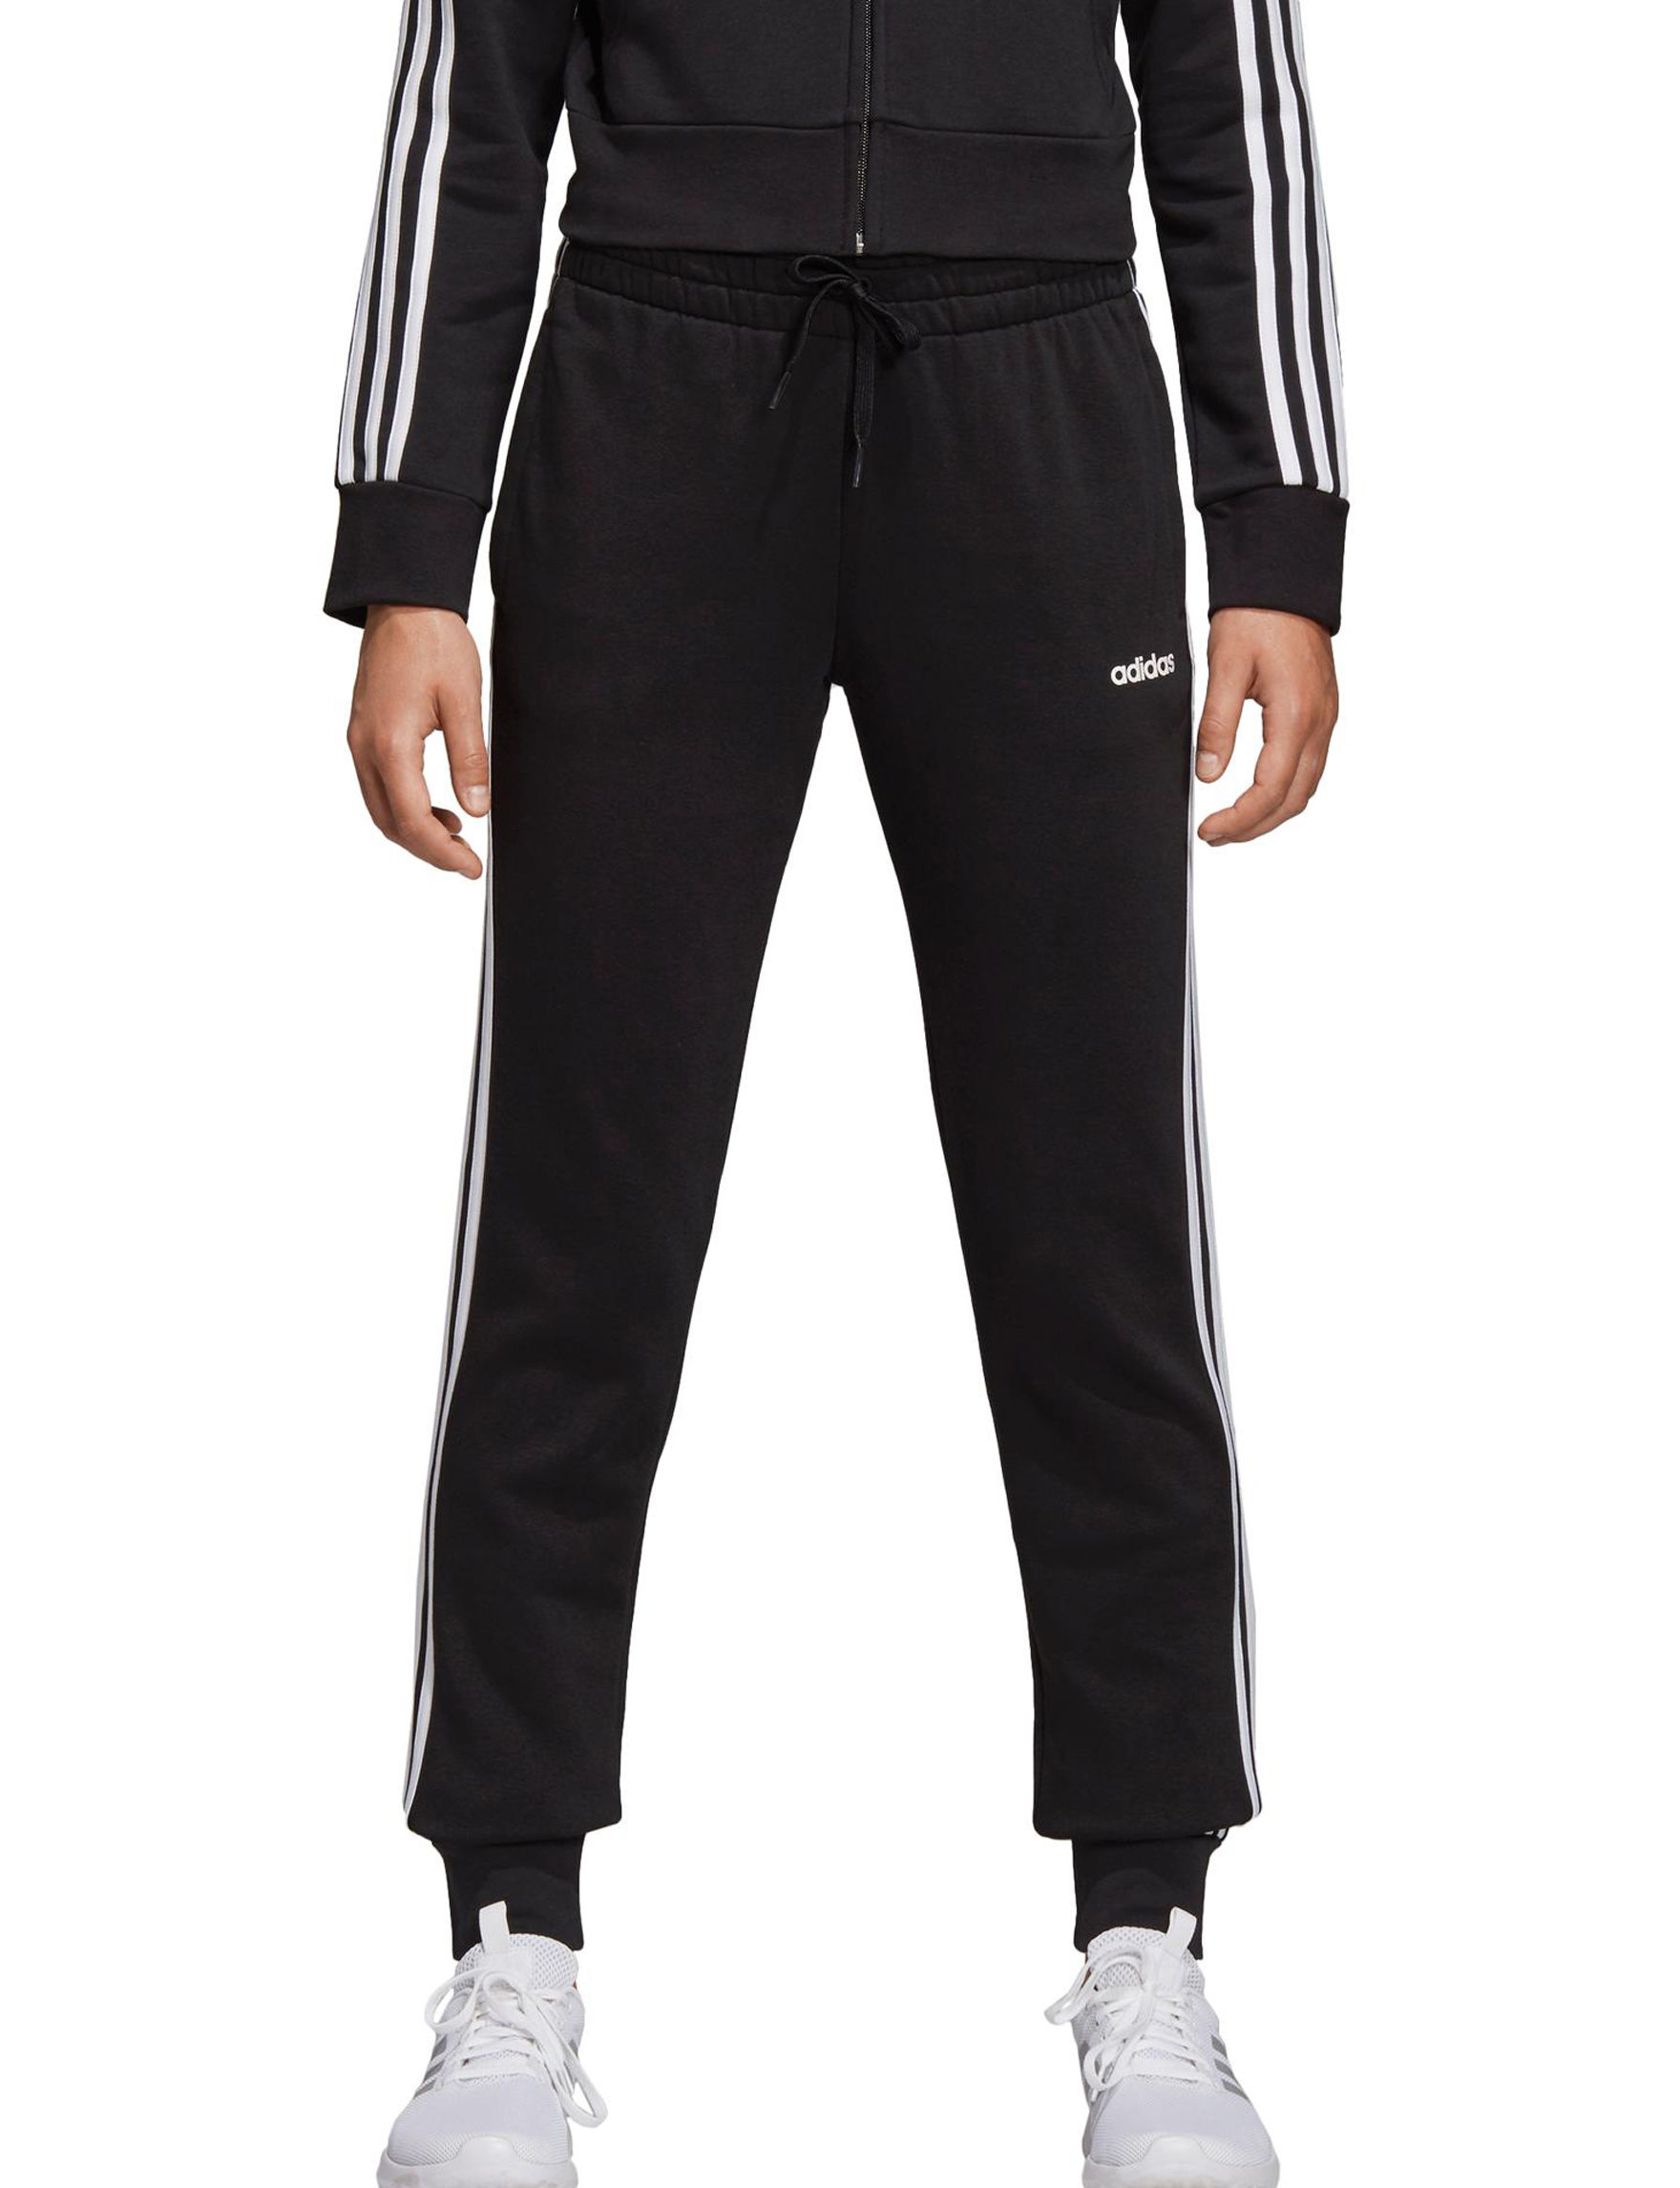 Adidas Black / White Active Jogger